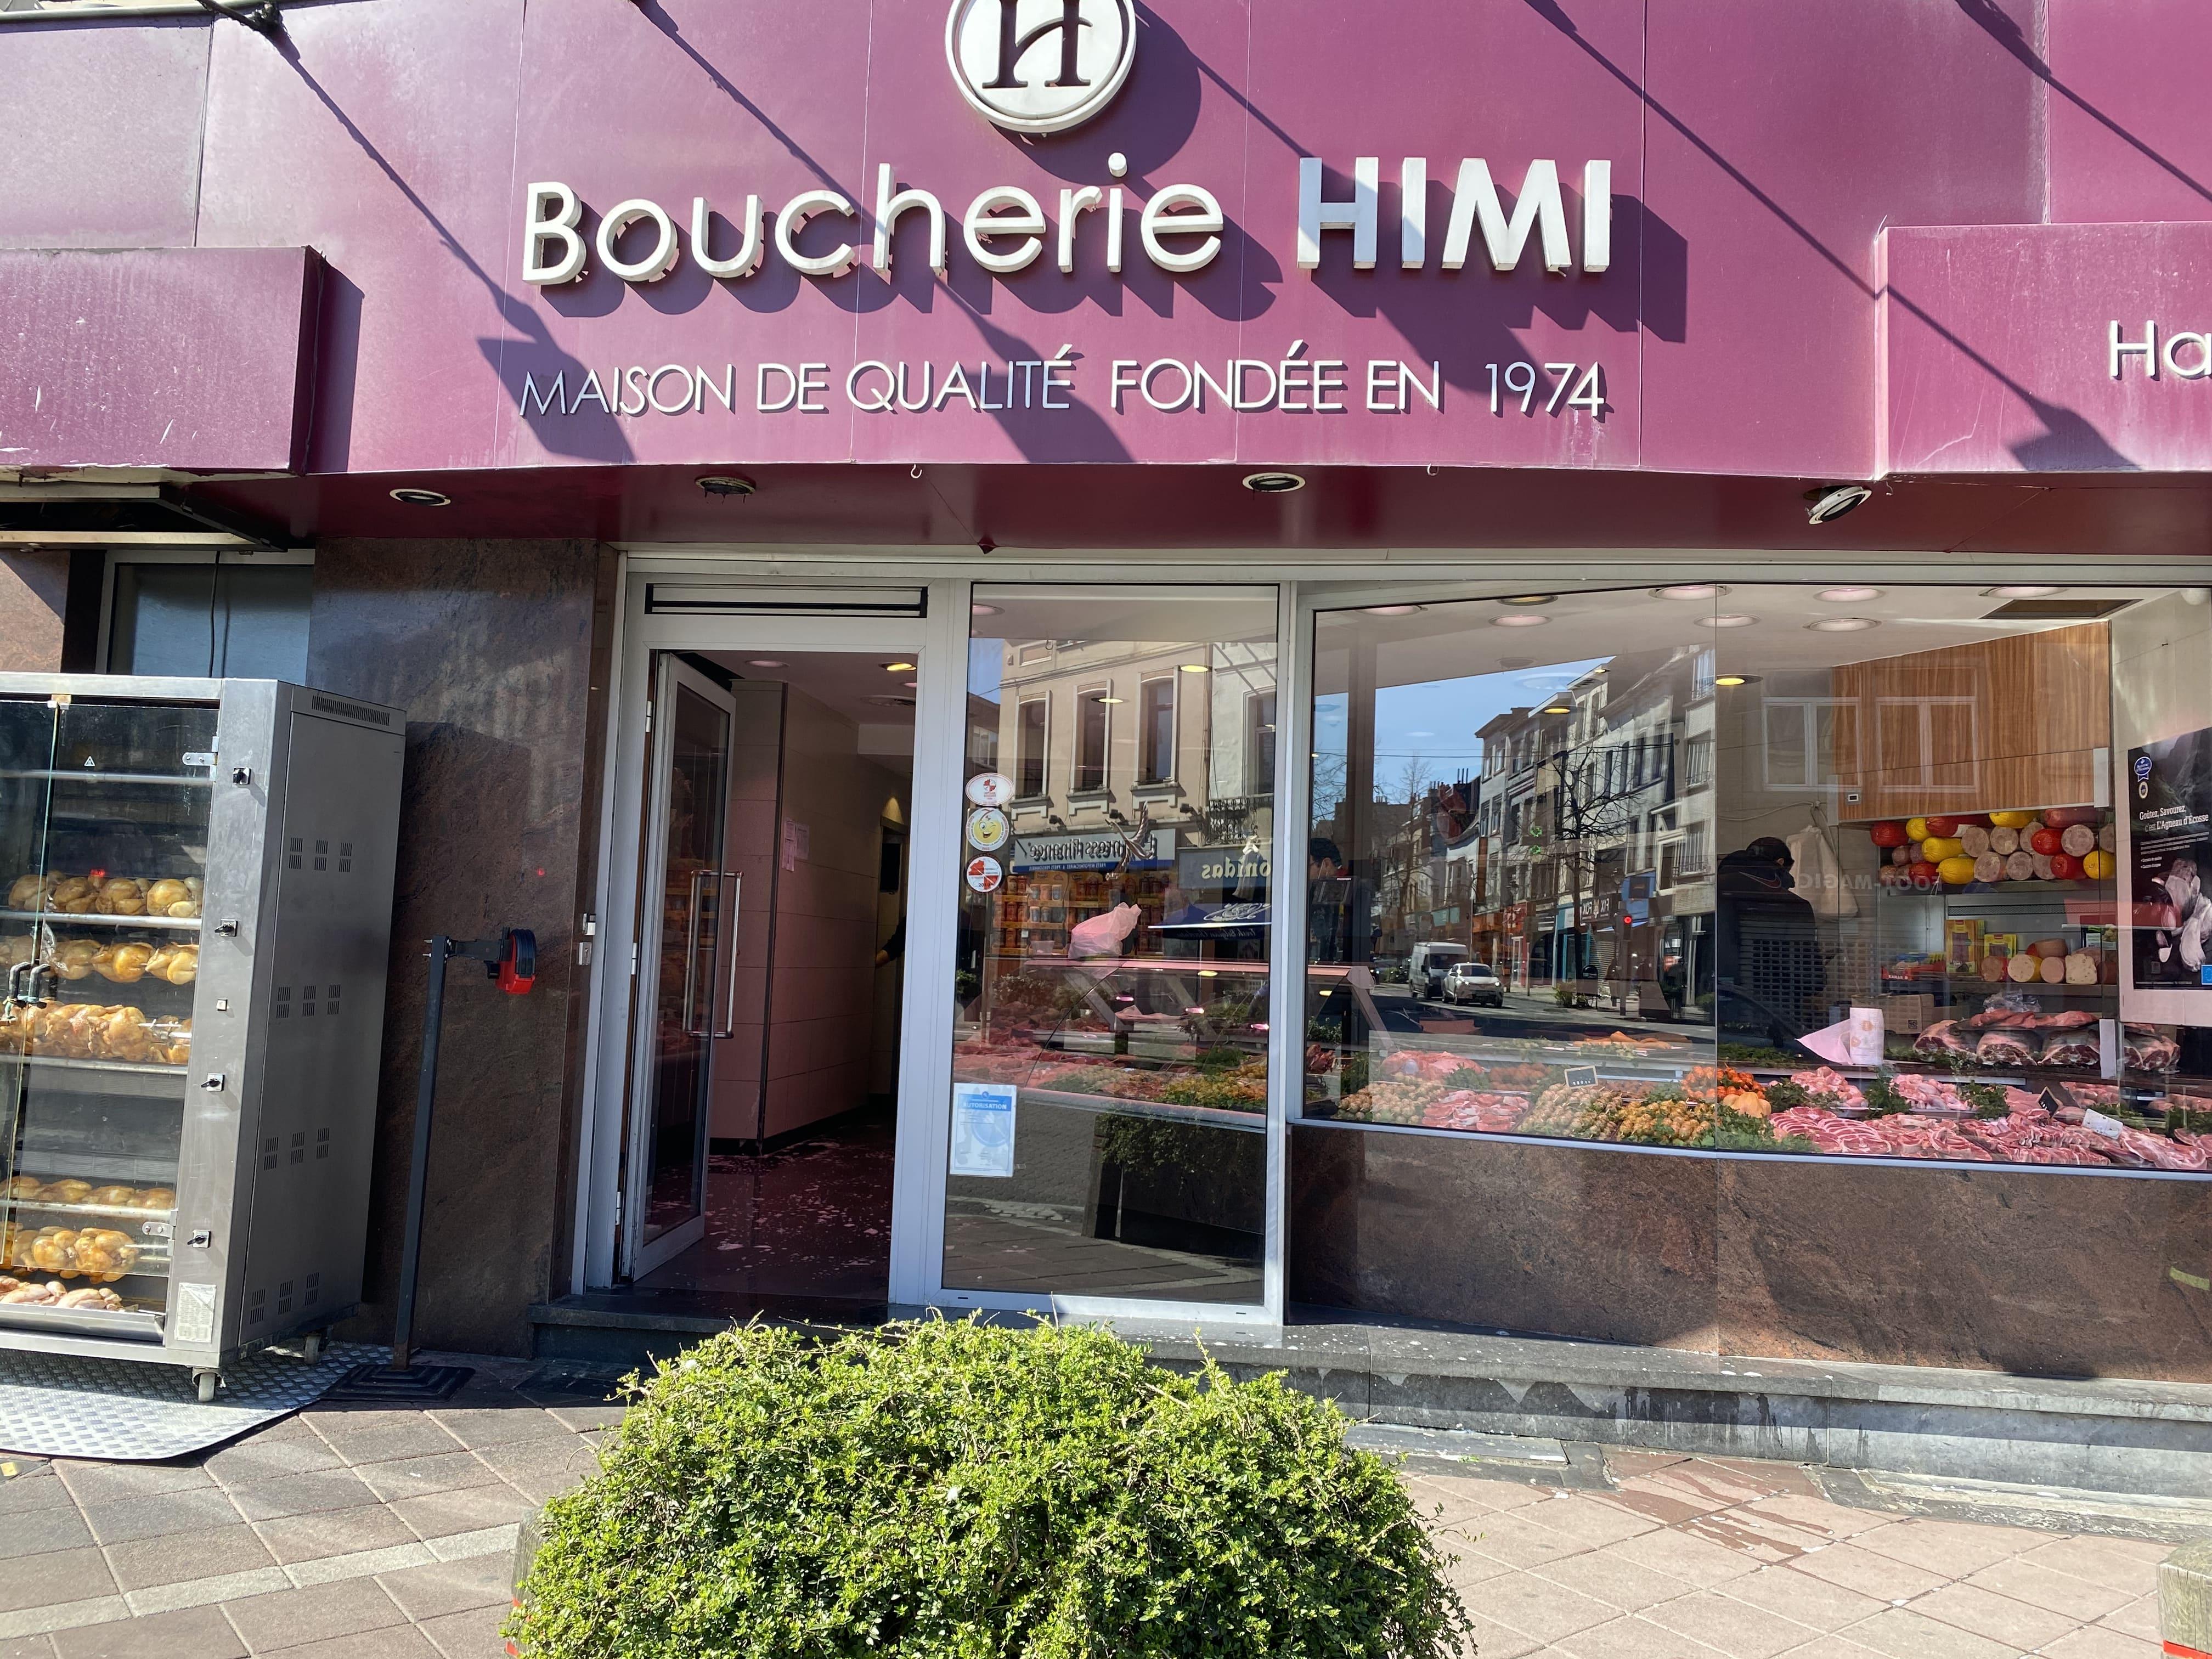 Boucherie Himi